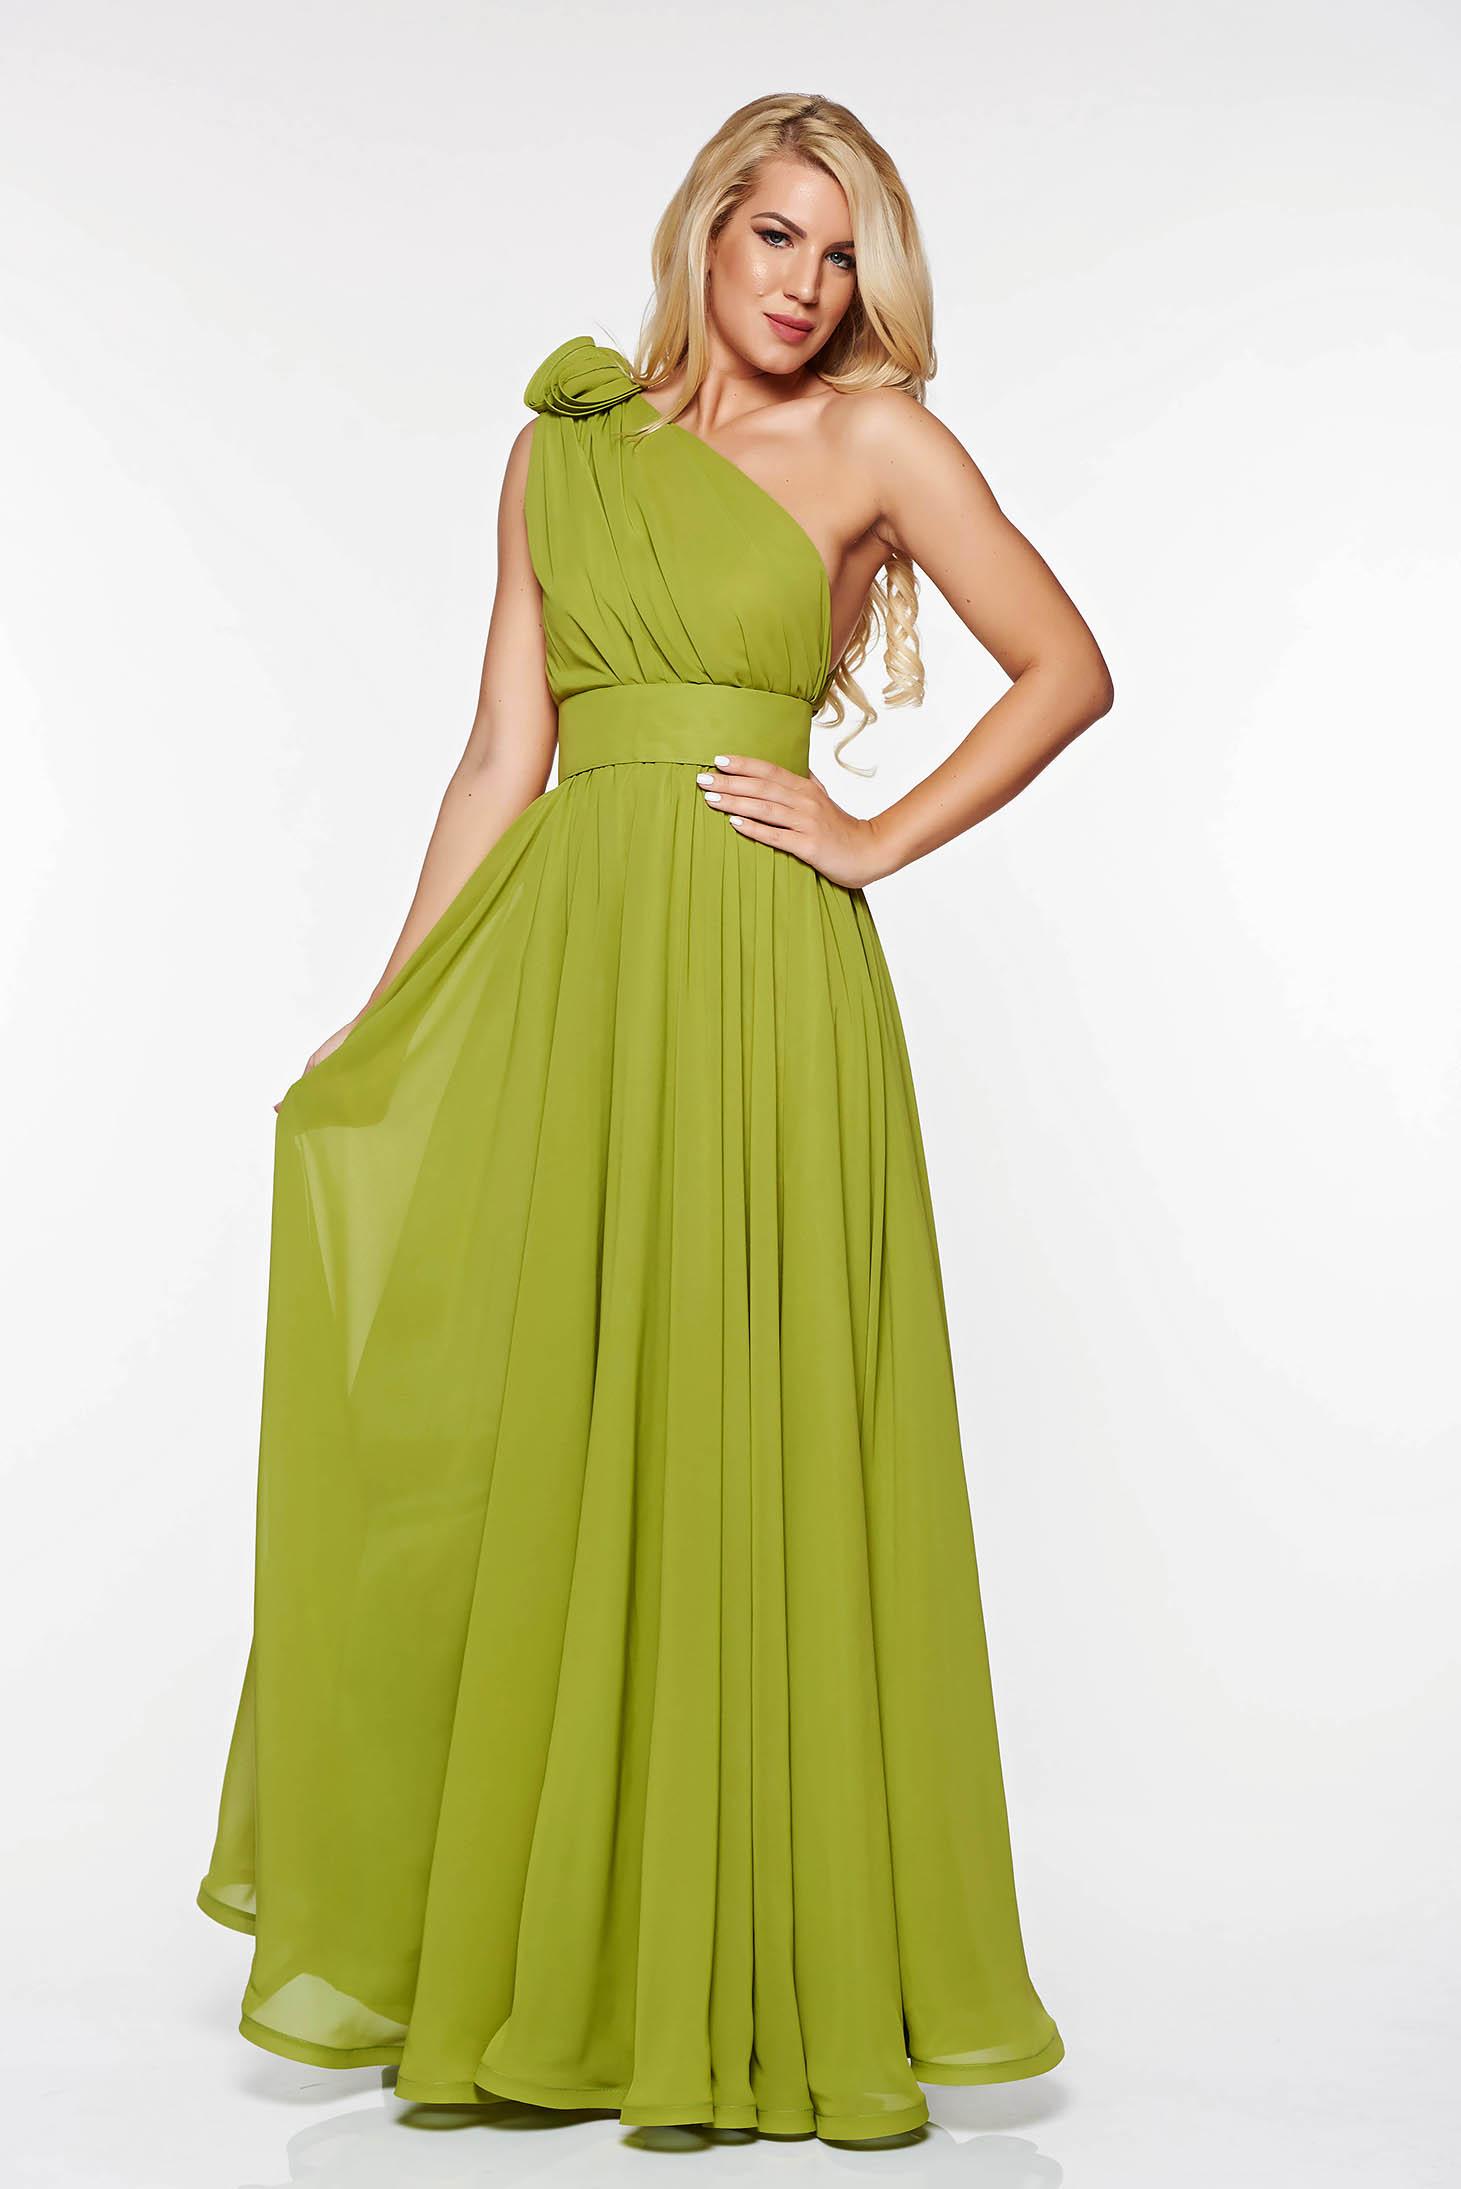 Rochie Ana Radu verde-deschis de lux in clos din voal pe umar accesorizata cu cordon cu aplicatii florale